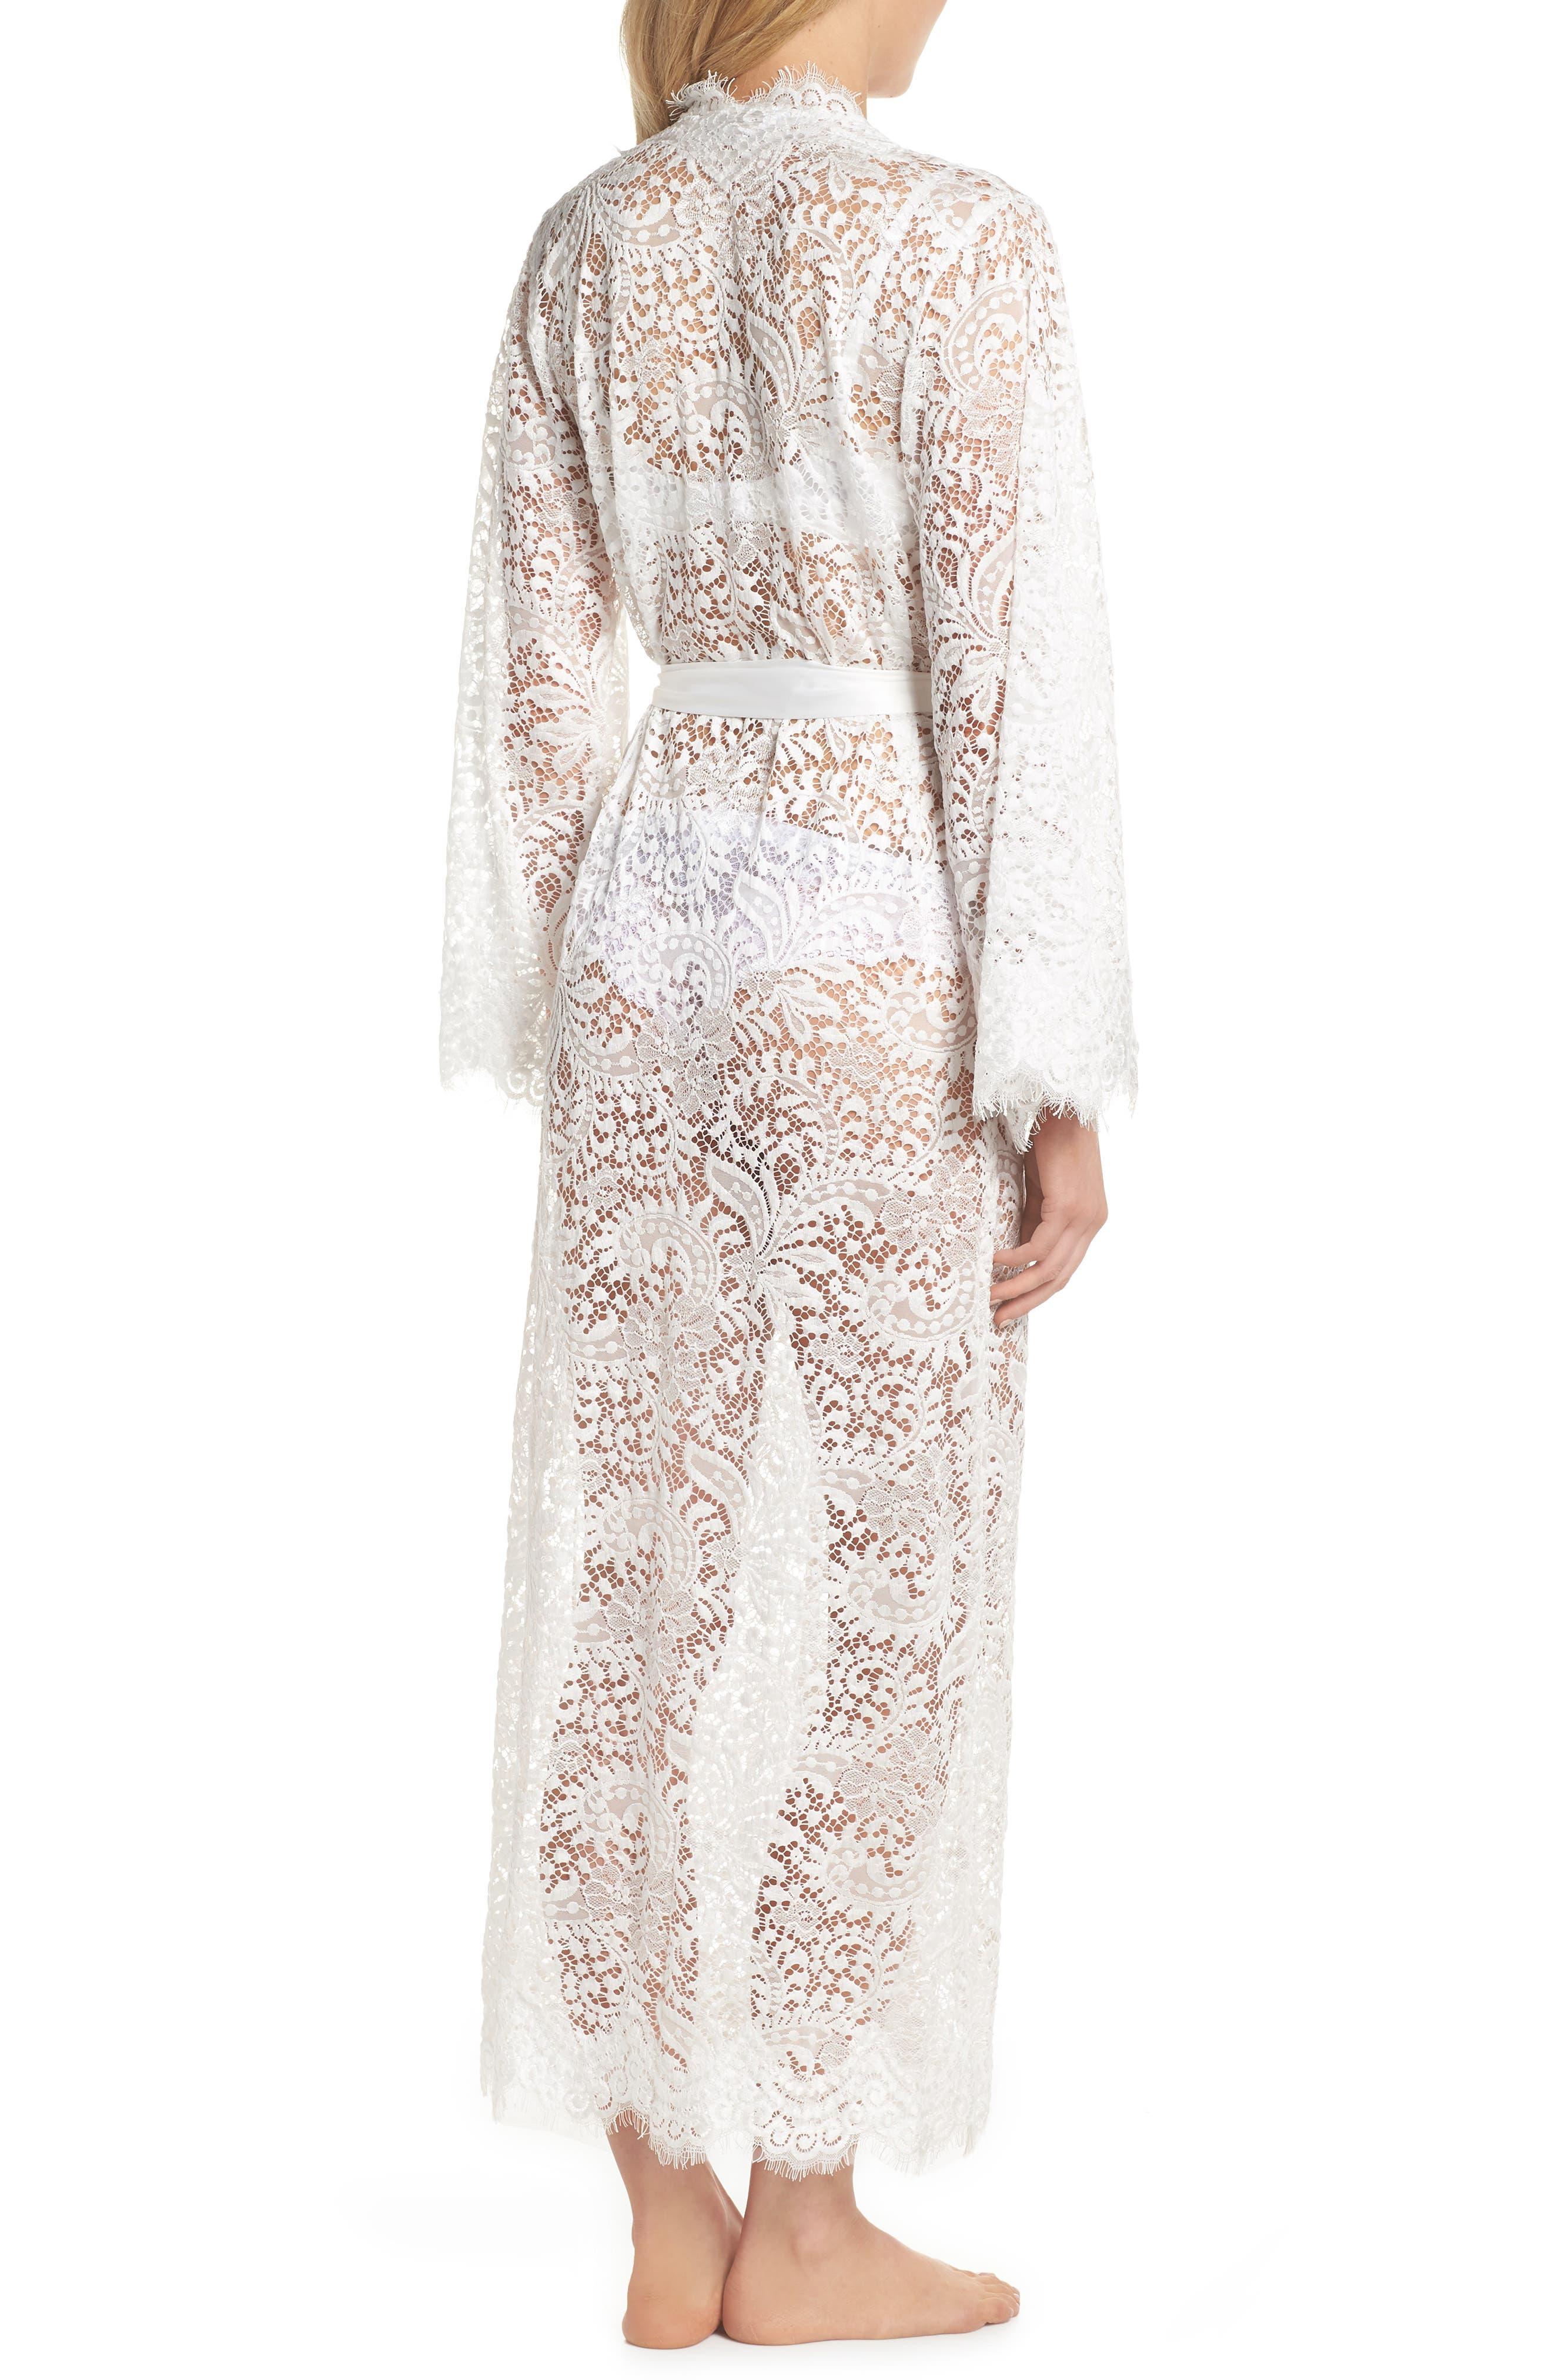 HOMEBODII,                             Anemone Long Lace Wrap,                             Alternate thumbnail 2, color,                             WHITE